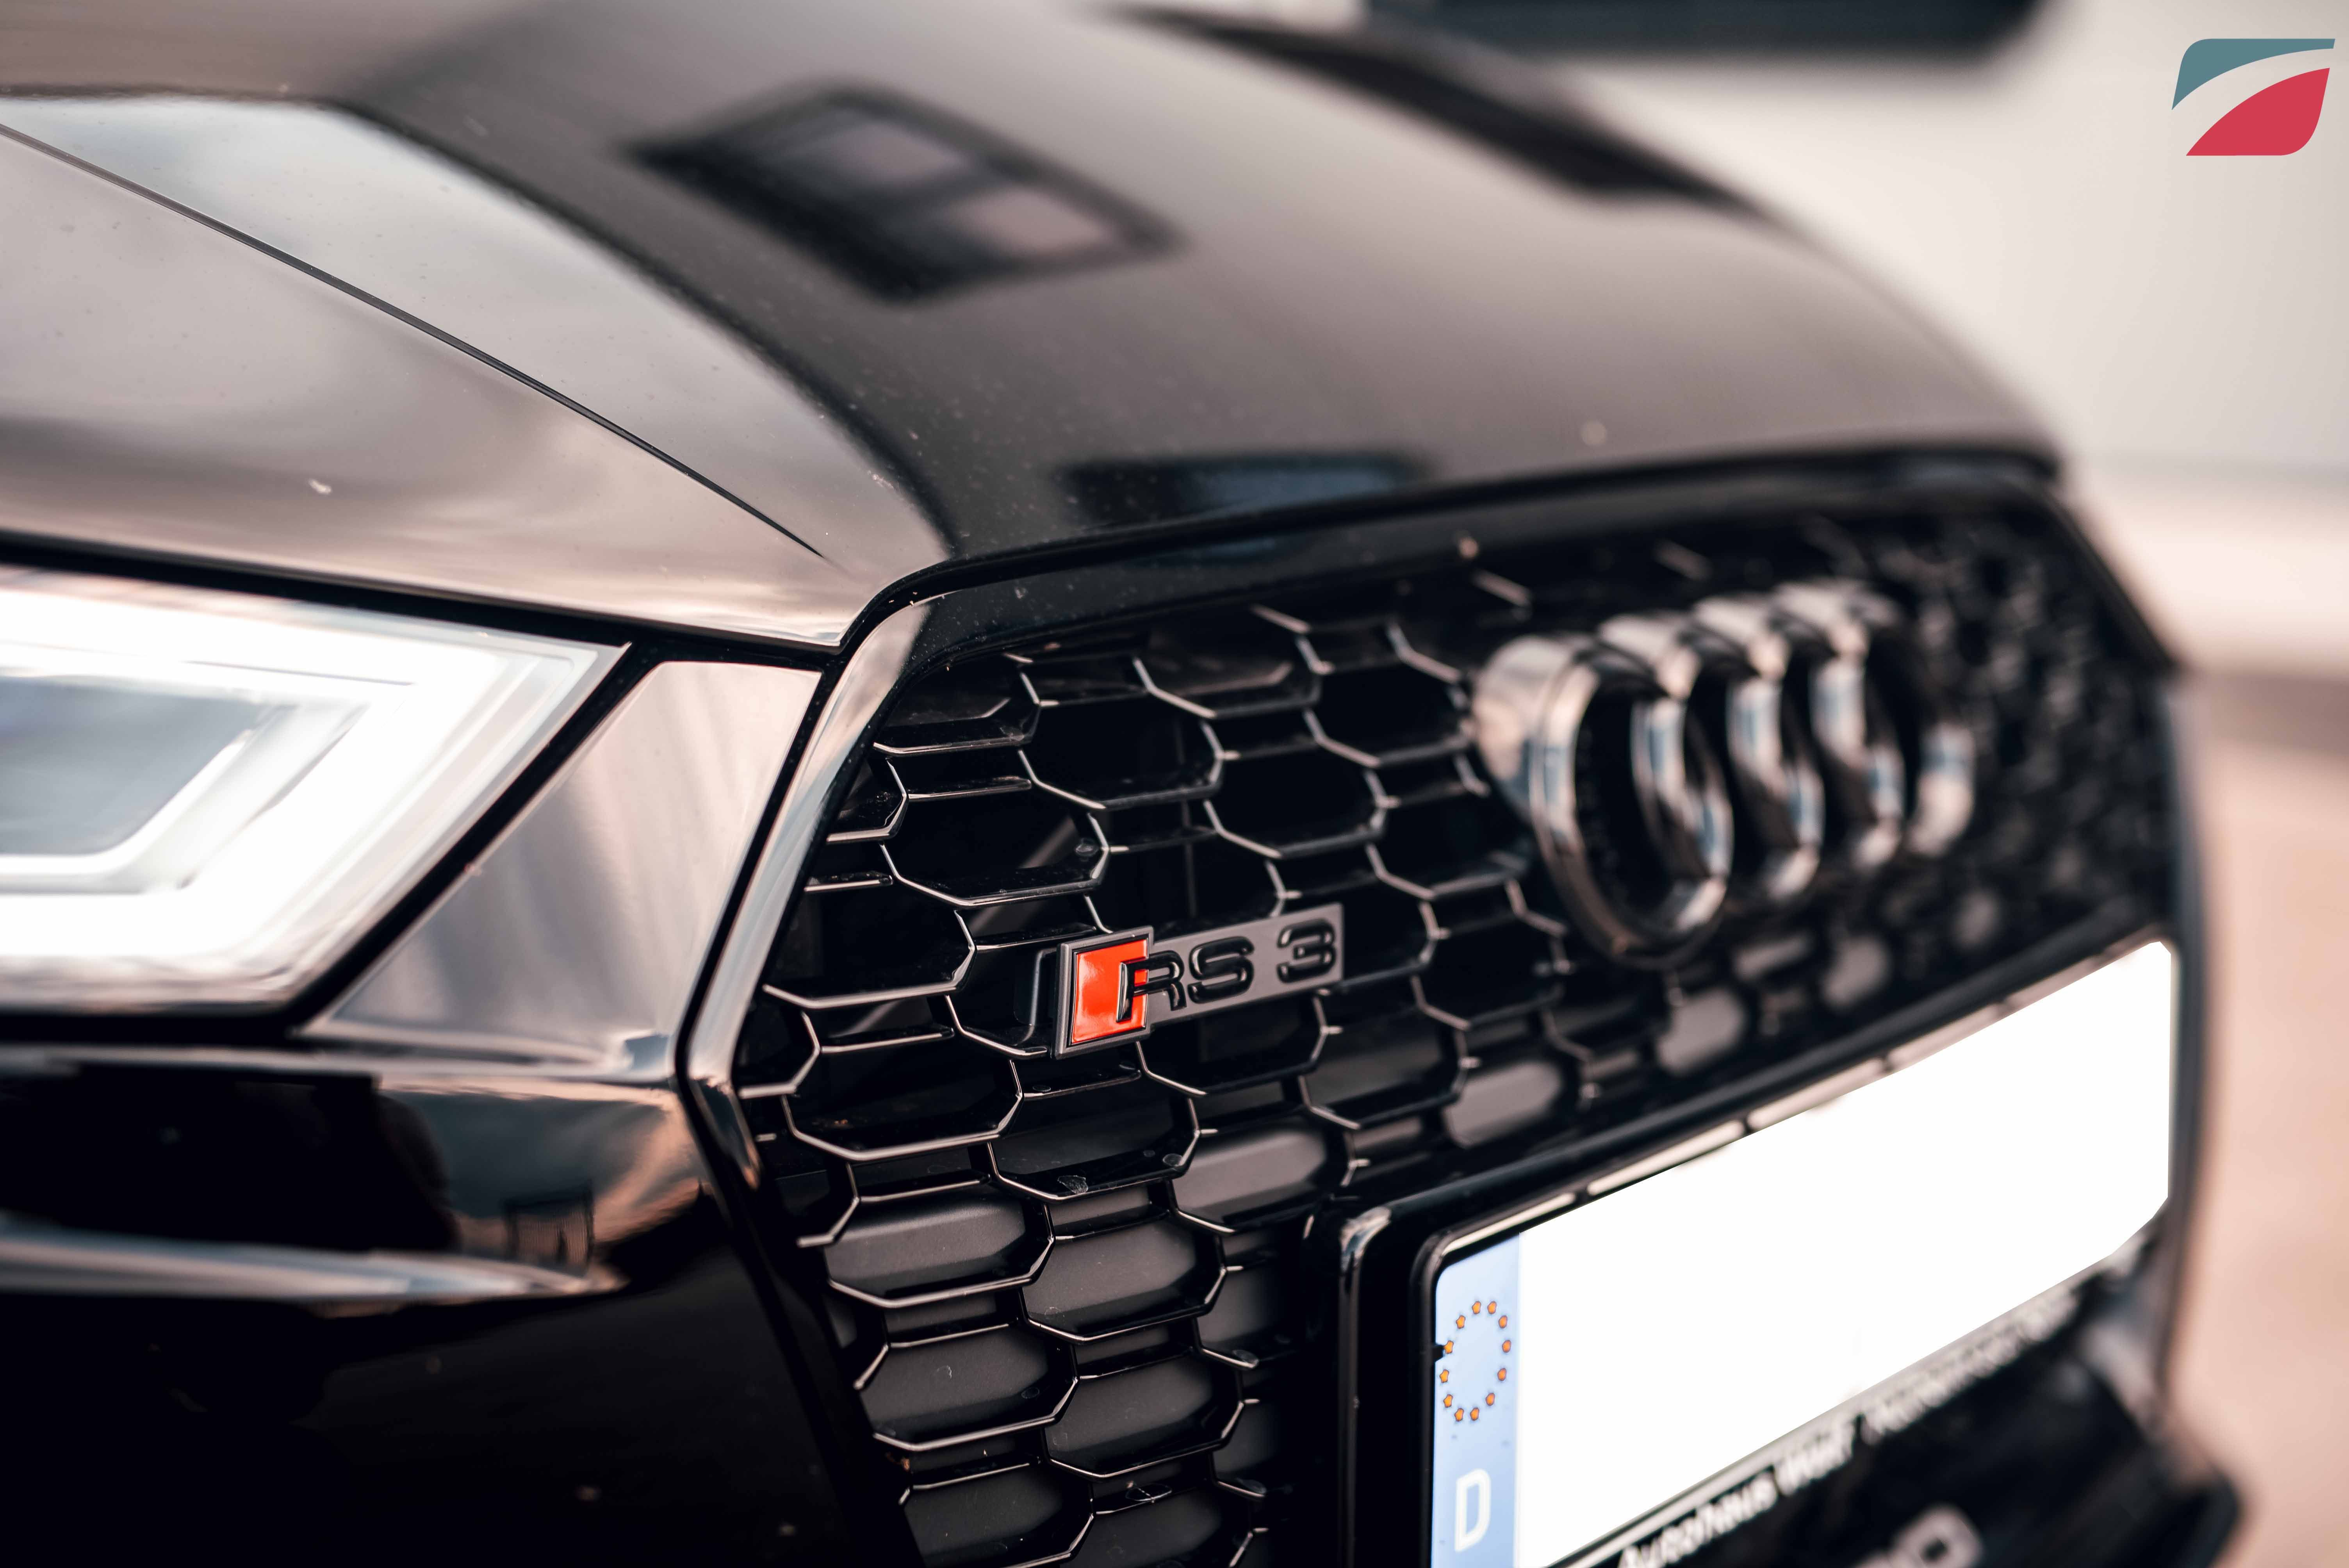 Audi Rs3 In 2020 Audi Rs3 Sportback Automarken Audi